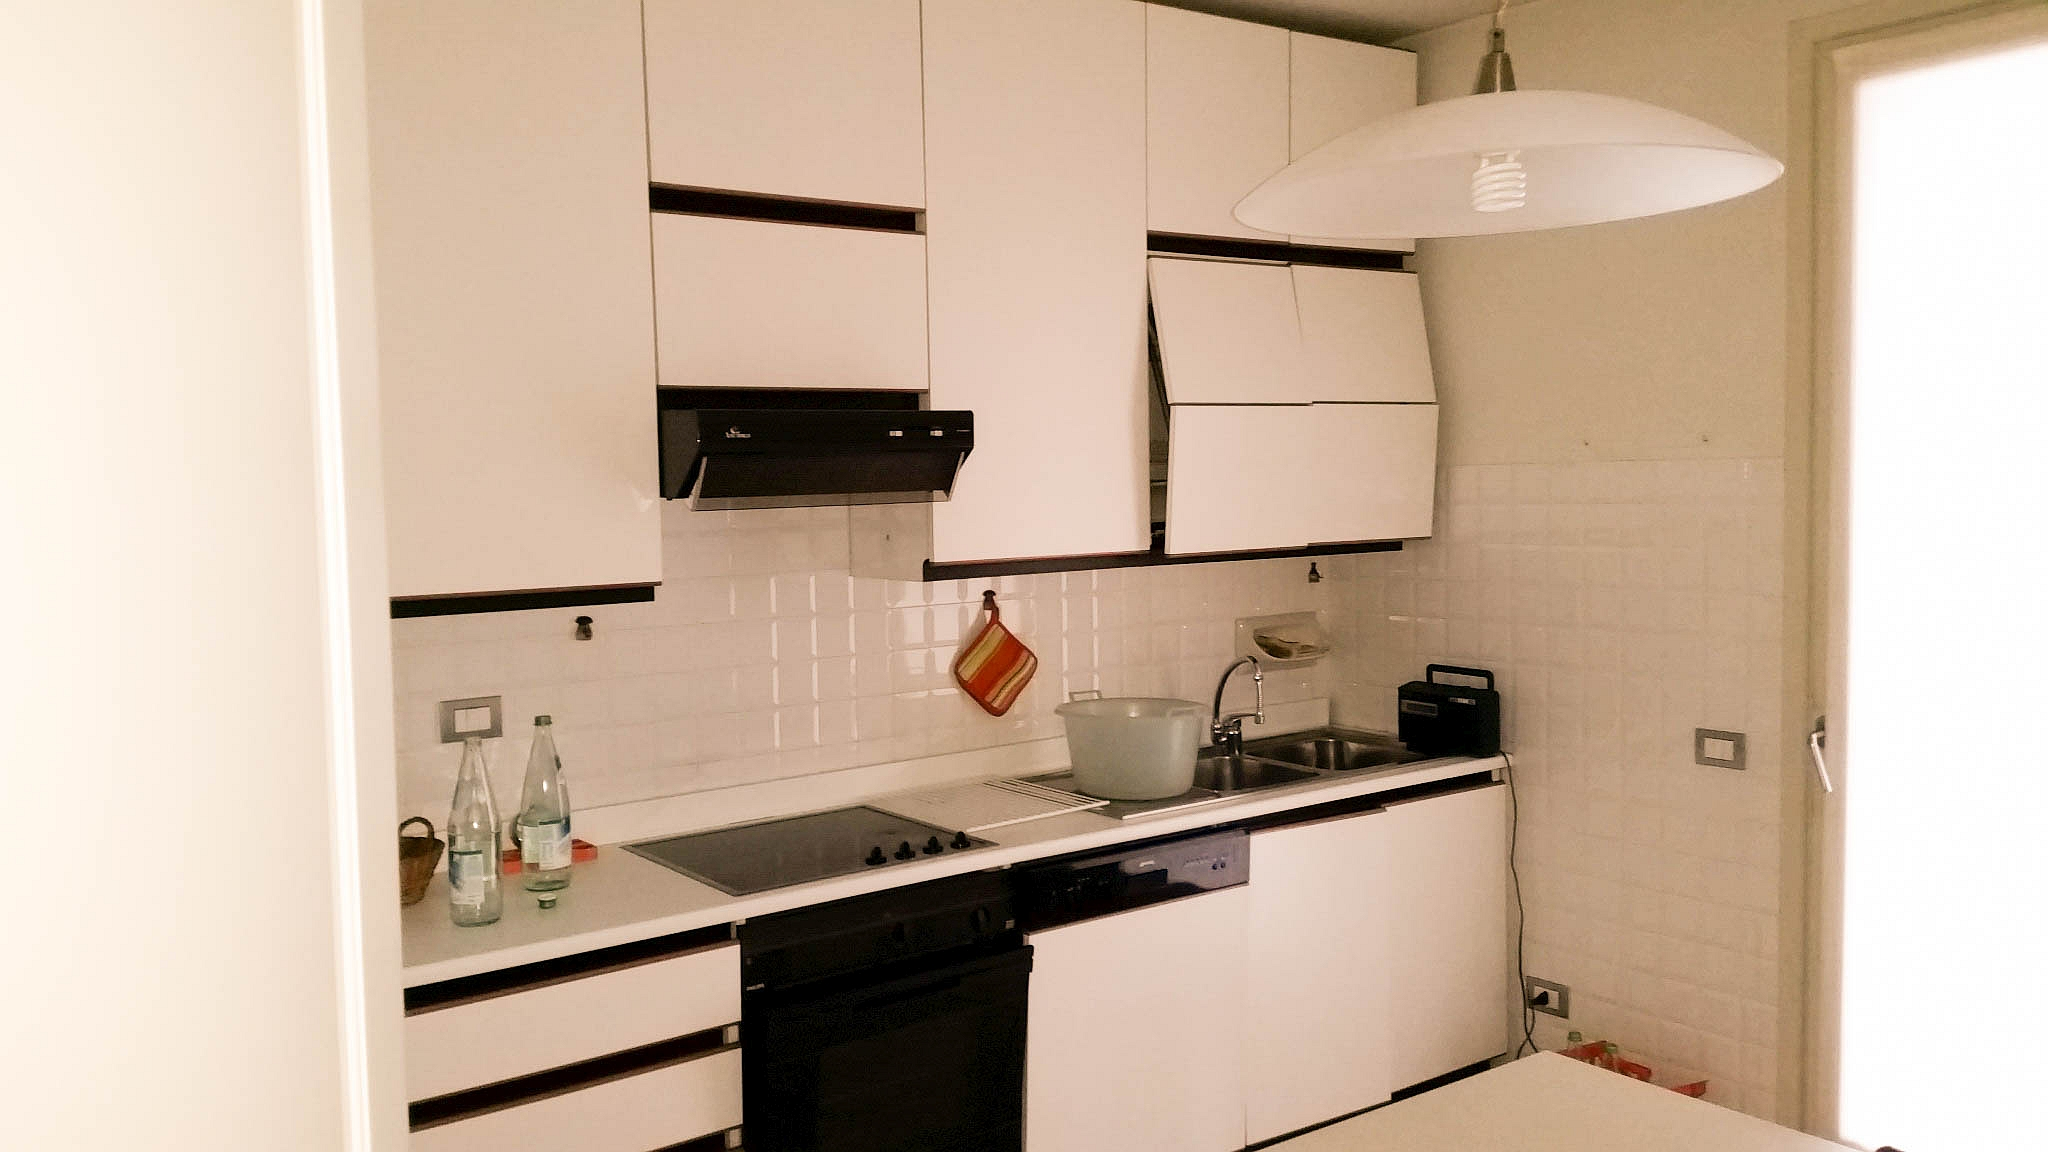 Awesome La Cucina Mantova Ideas - Amazing House Design ...